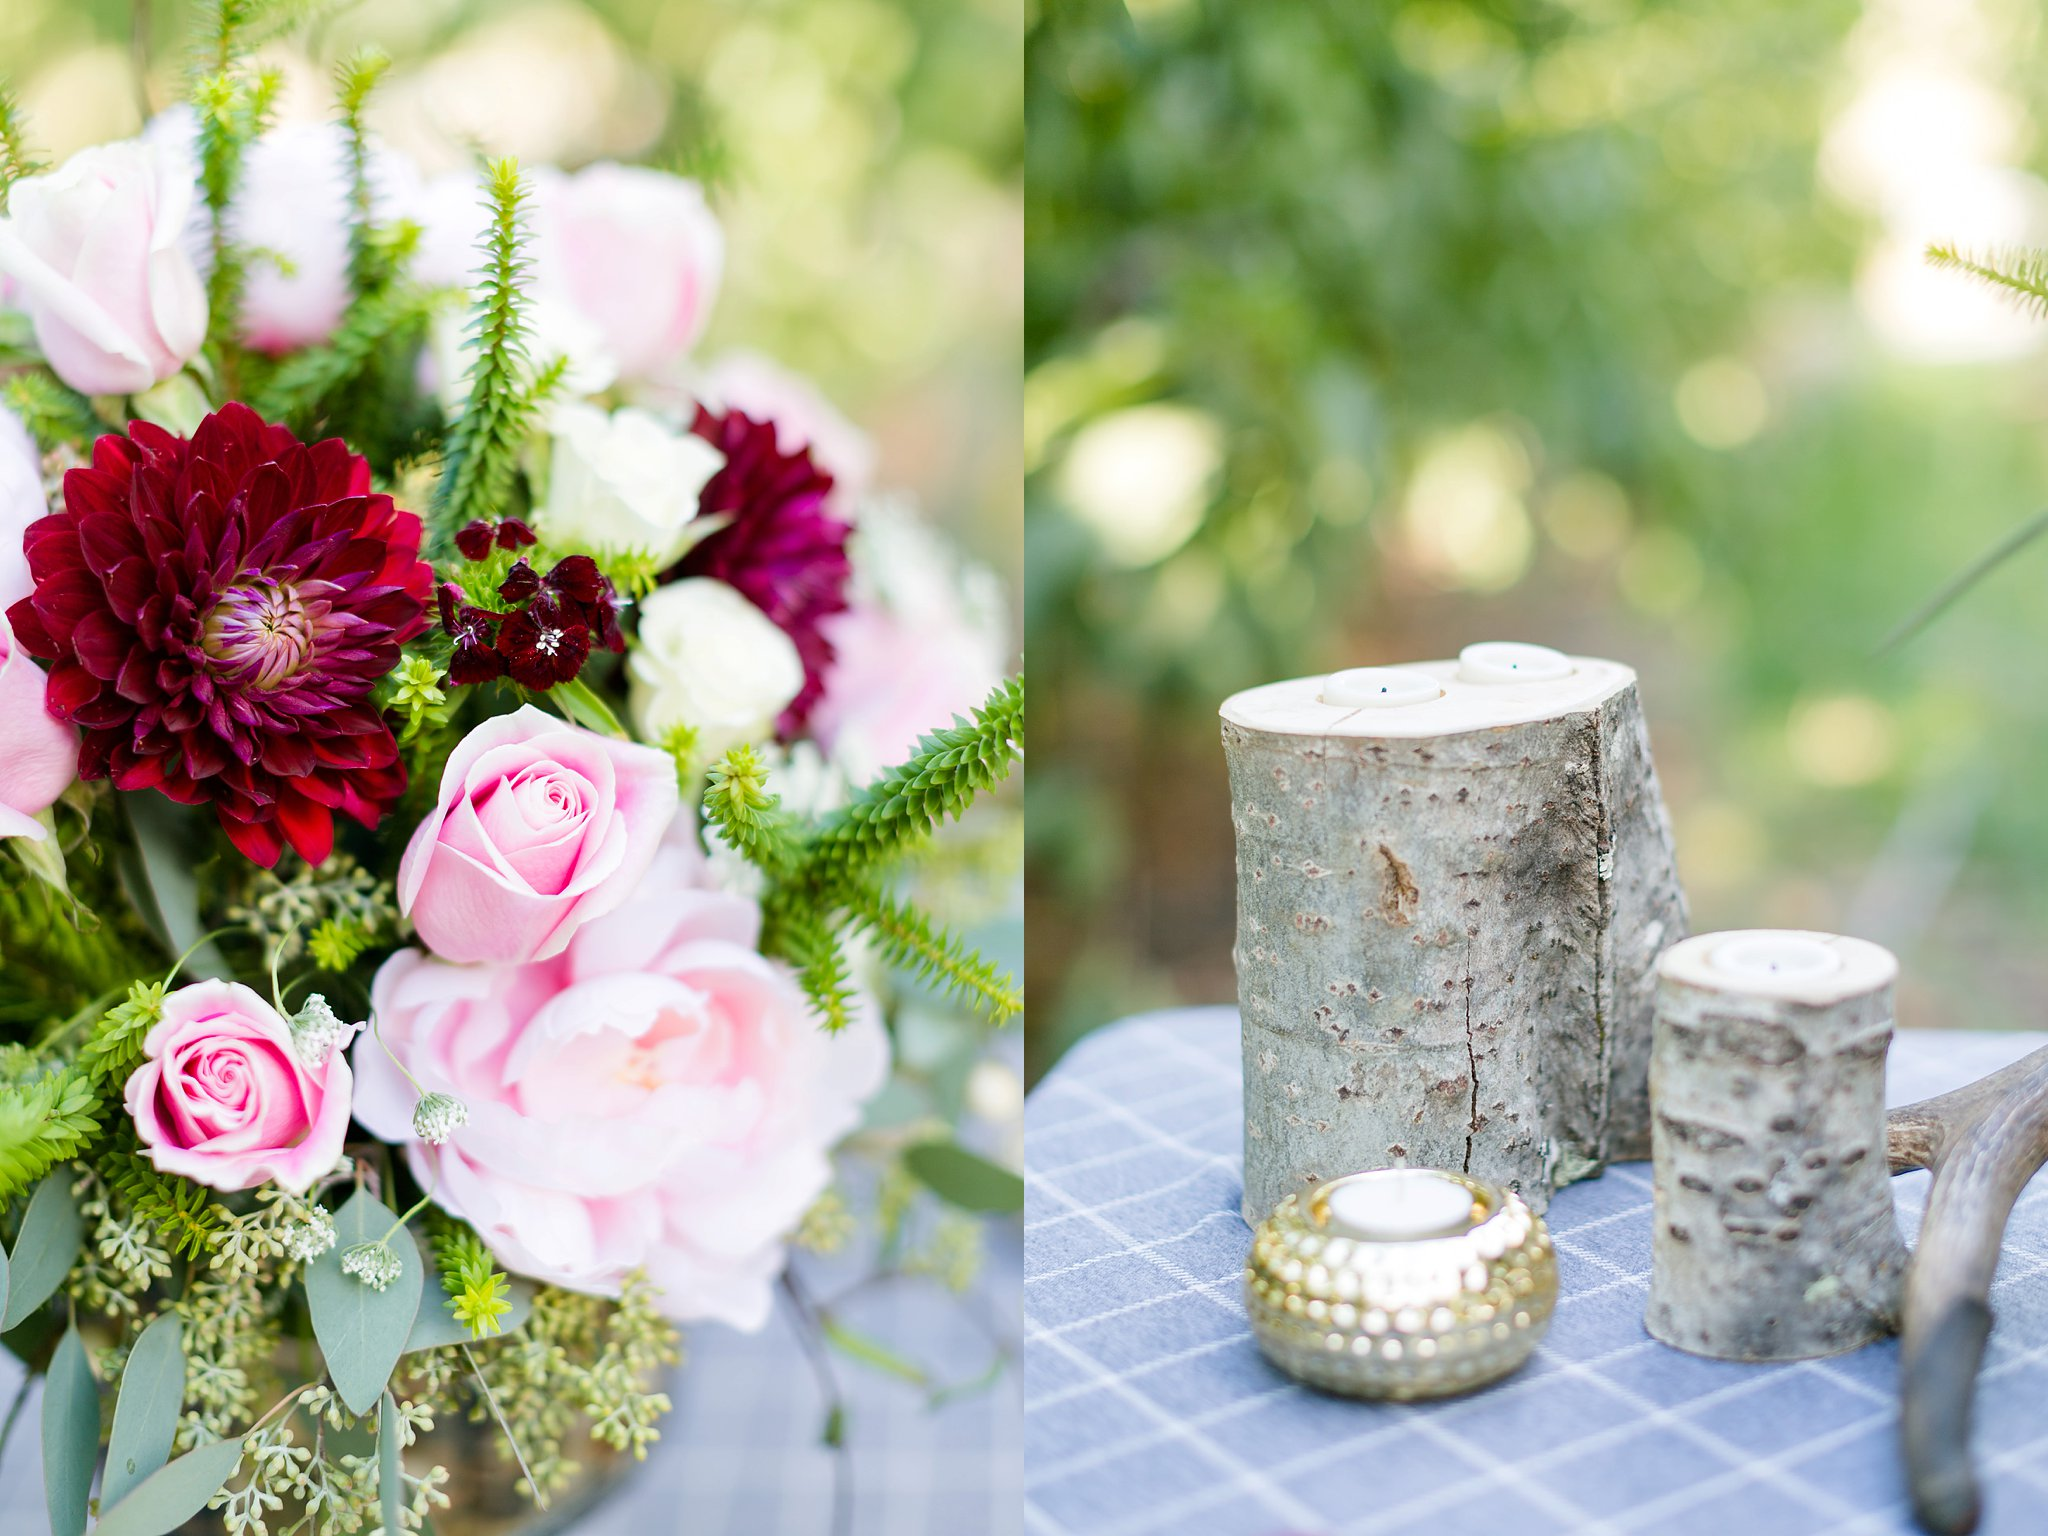 Chelan Washington Wedding Photos Megan Kelsey Photography Delight Wedding Workshop Styled Shoot Annalee & Scot-19.jpg